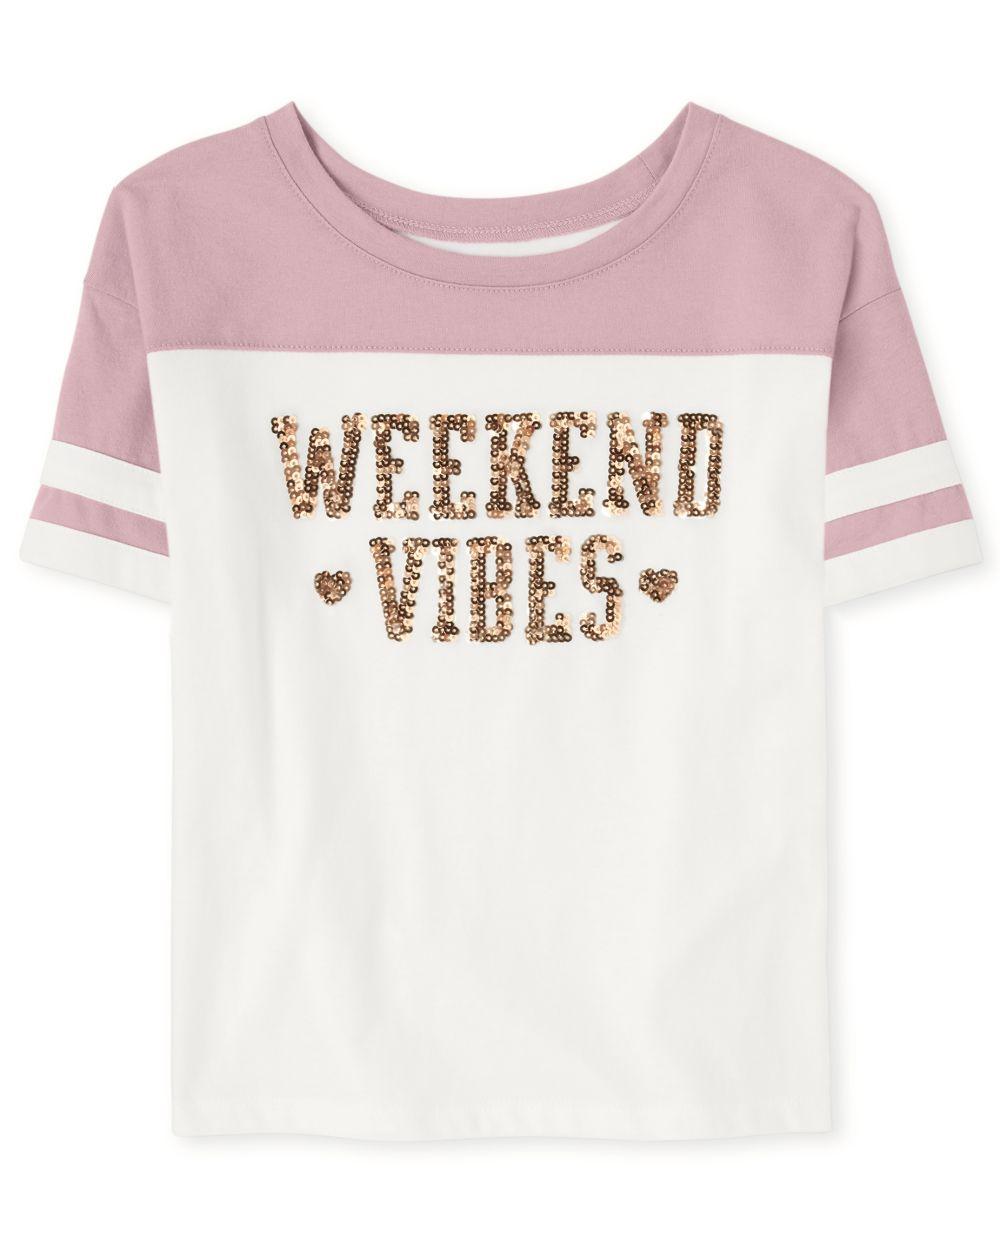 Top para niña Active Glitter Weekend Vibes